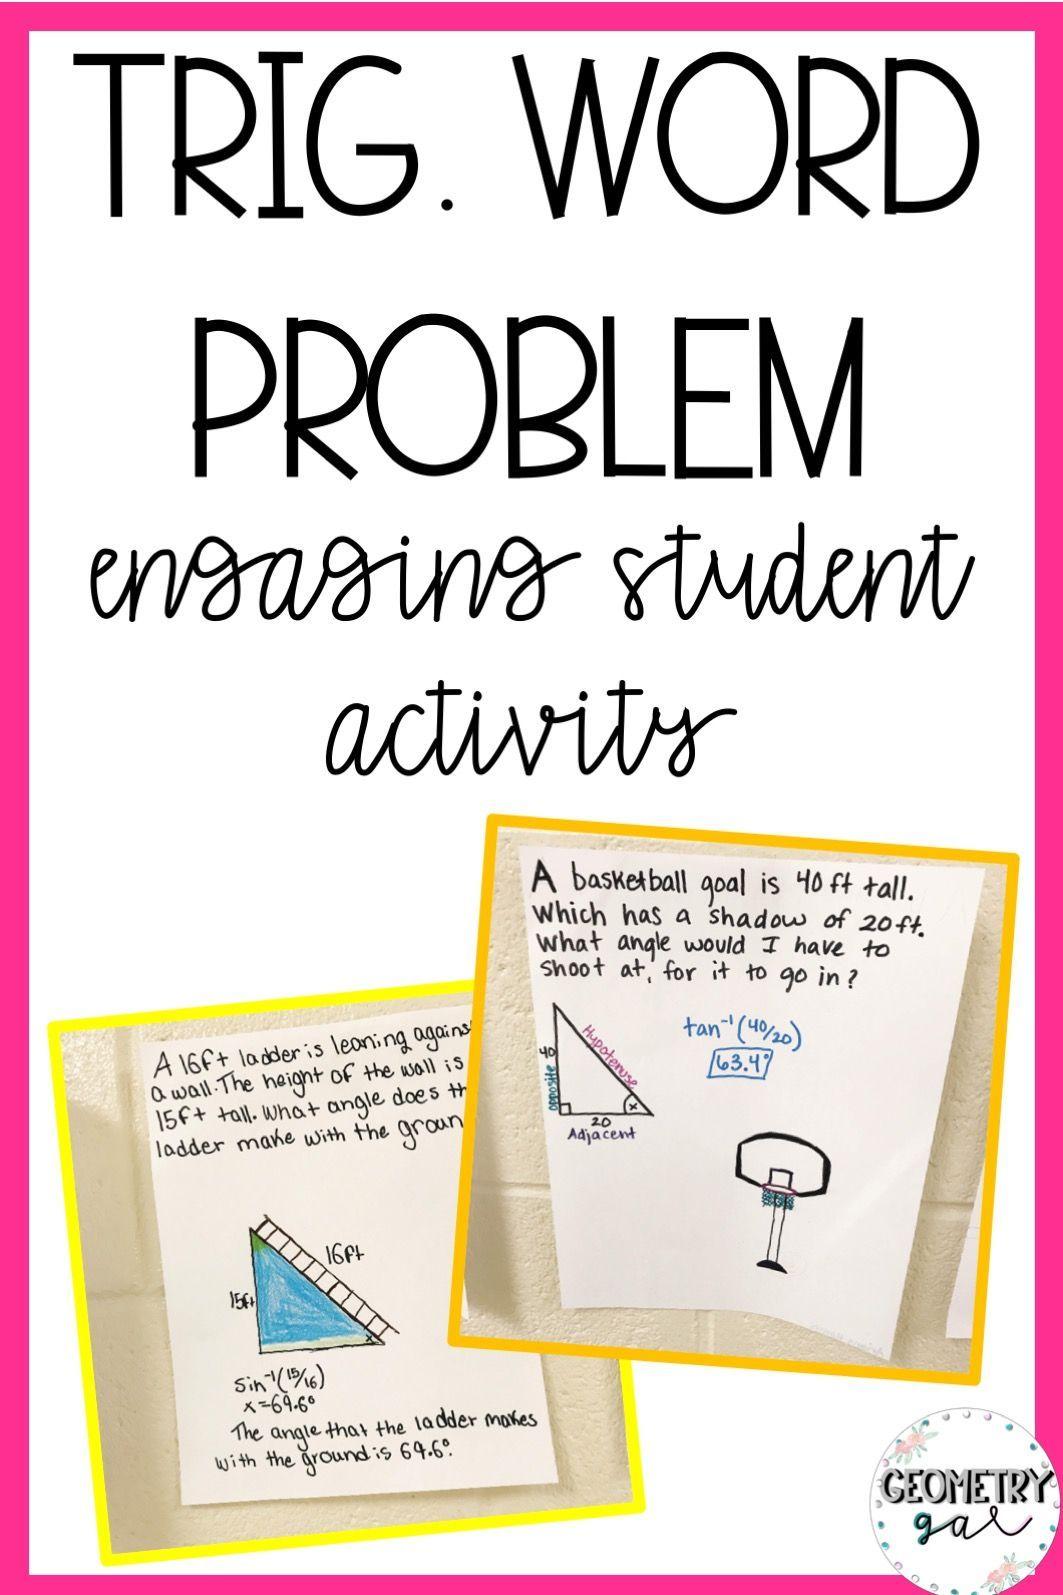 Trigonometry Lesson Word Problem Activity Lindsay Bowden Word Problems Word Problem Worksheets Geometry Lessons